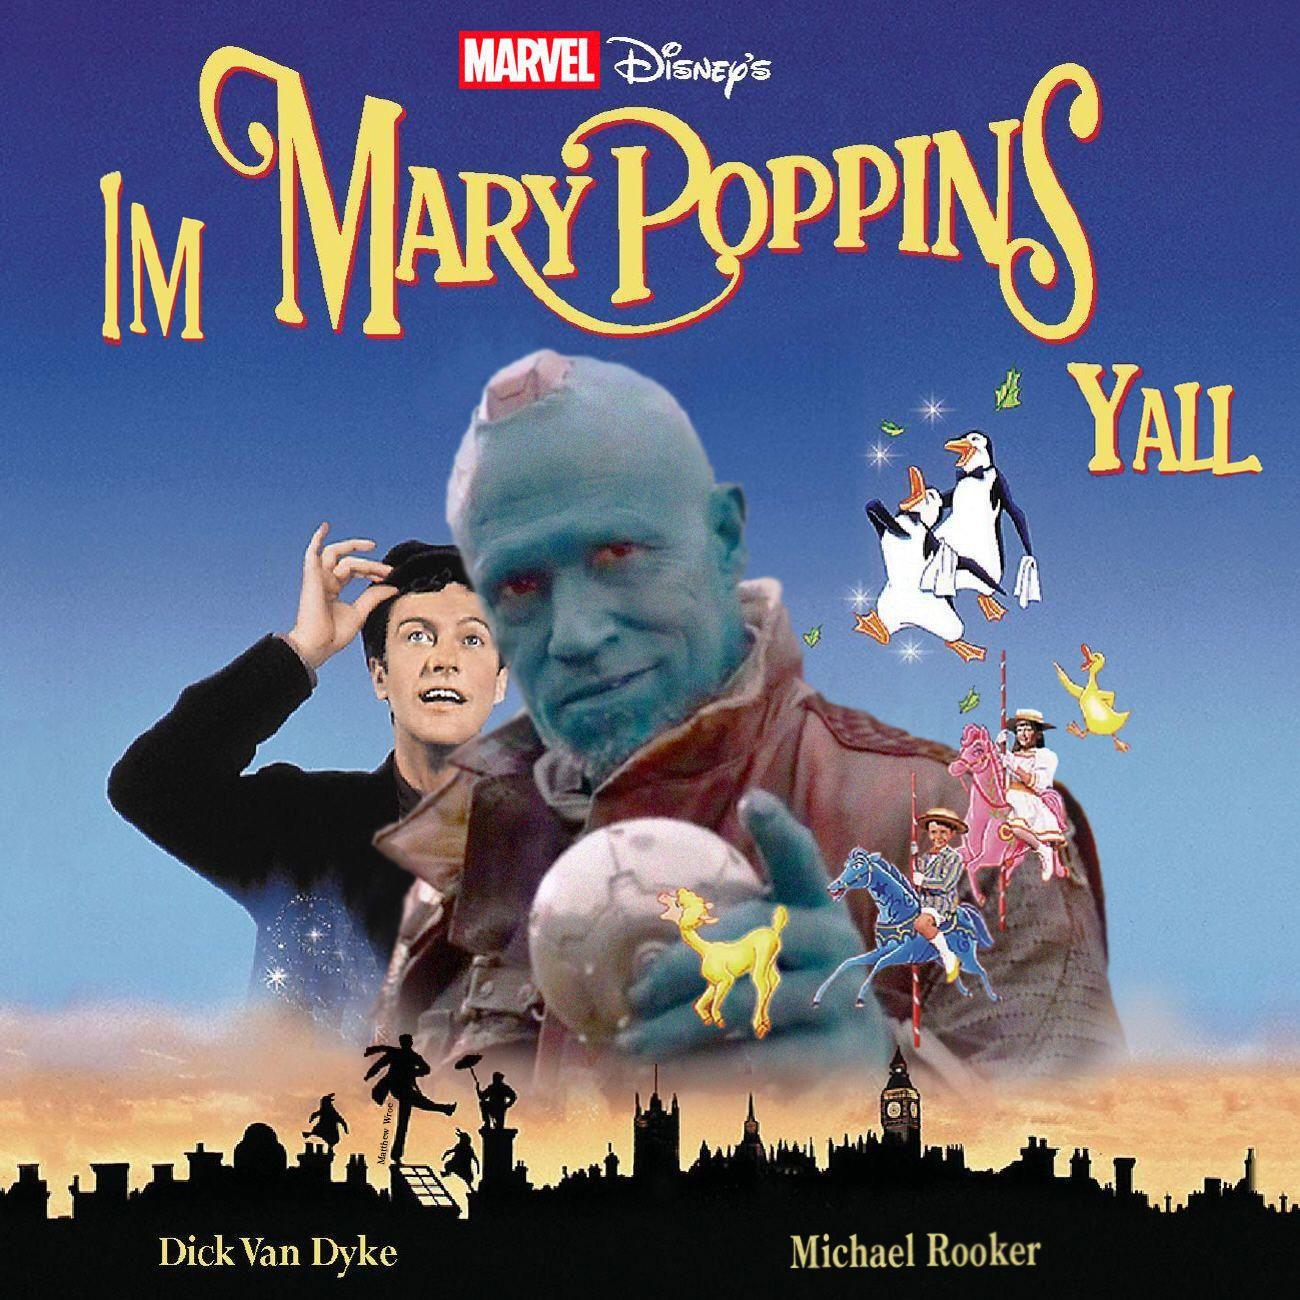 I M Mary Poppins Y All I M Mary Poppins Y All Marvel Funny M